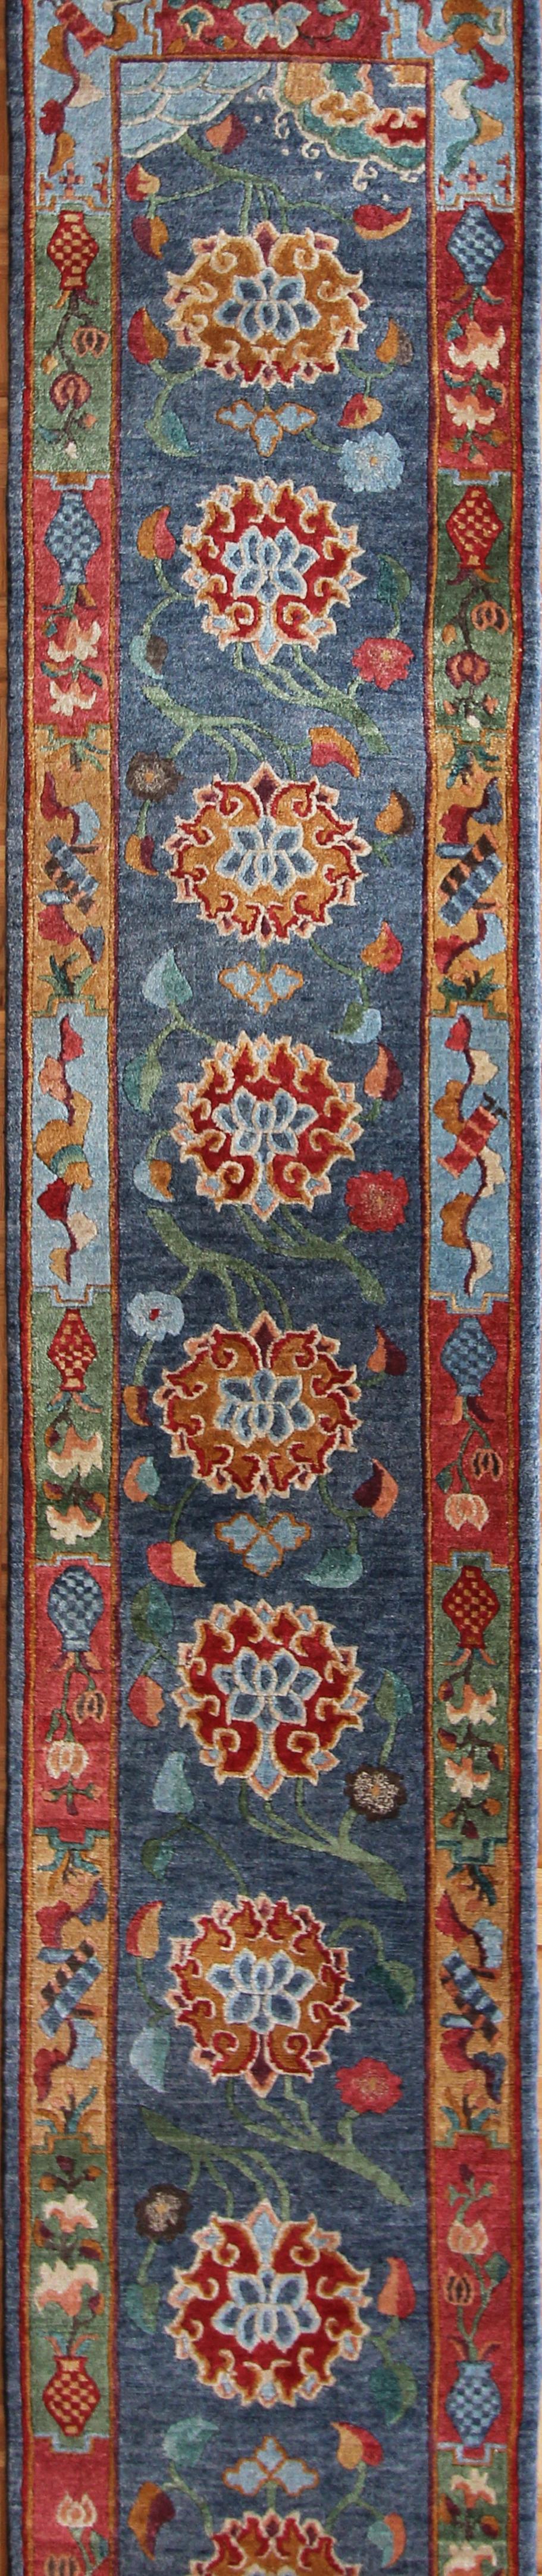 745 Classic Tibetan Floral, Tibet, 20'x2'6''